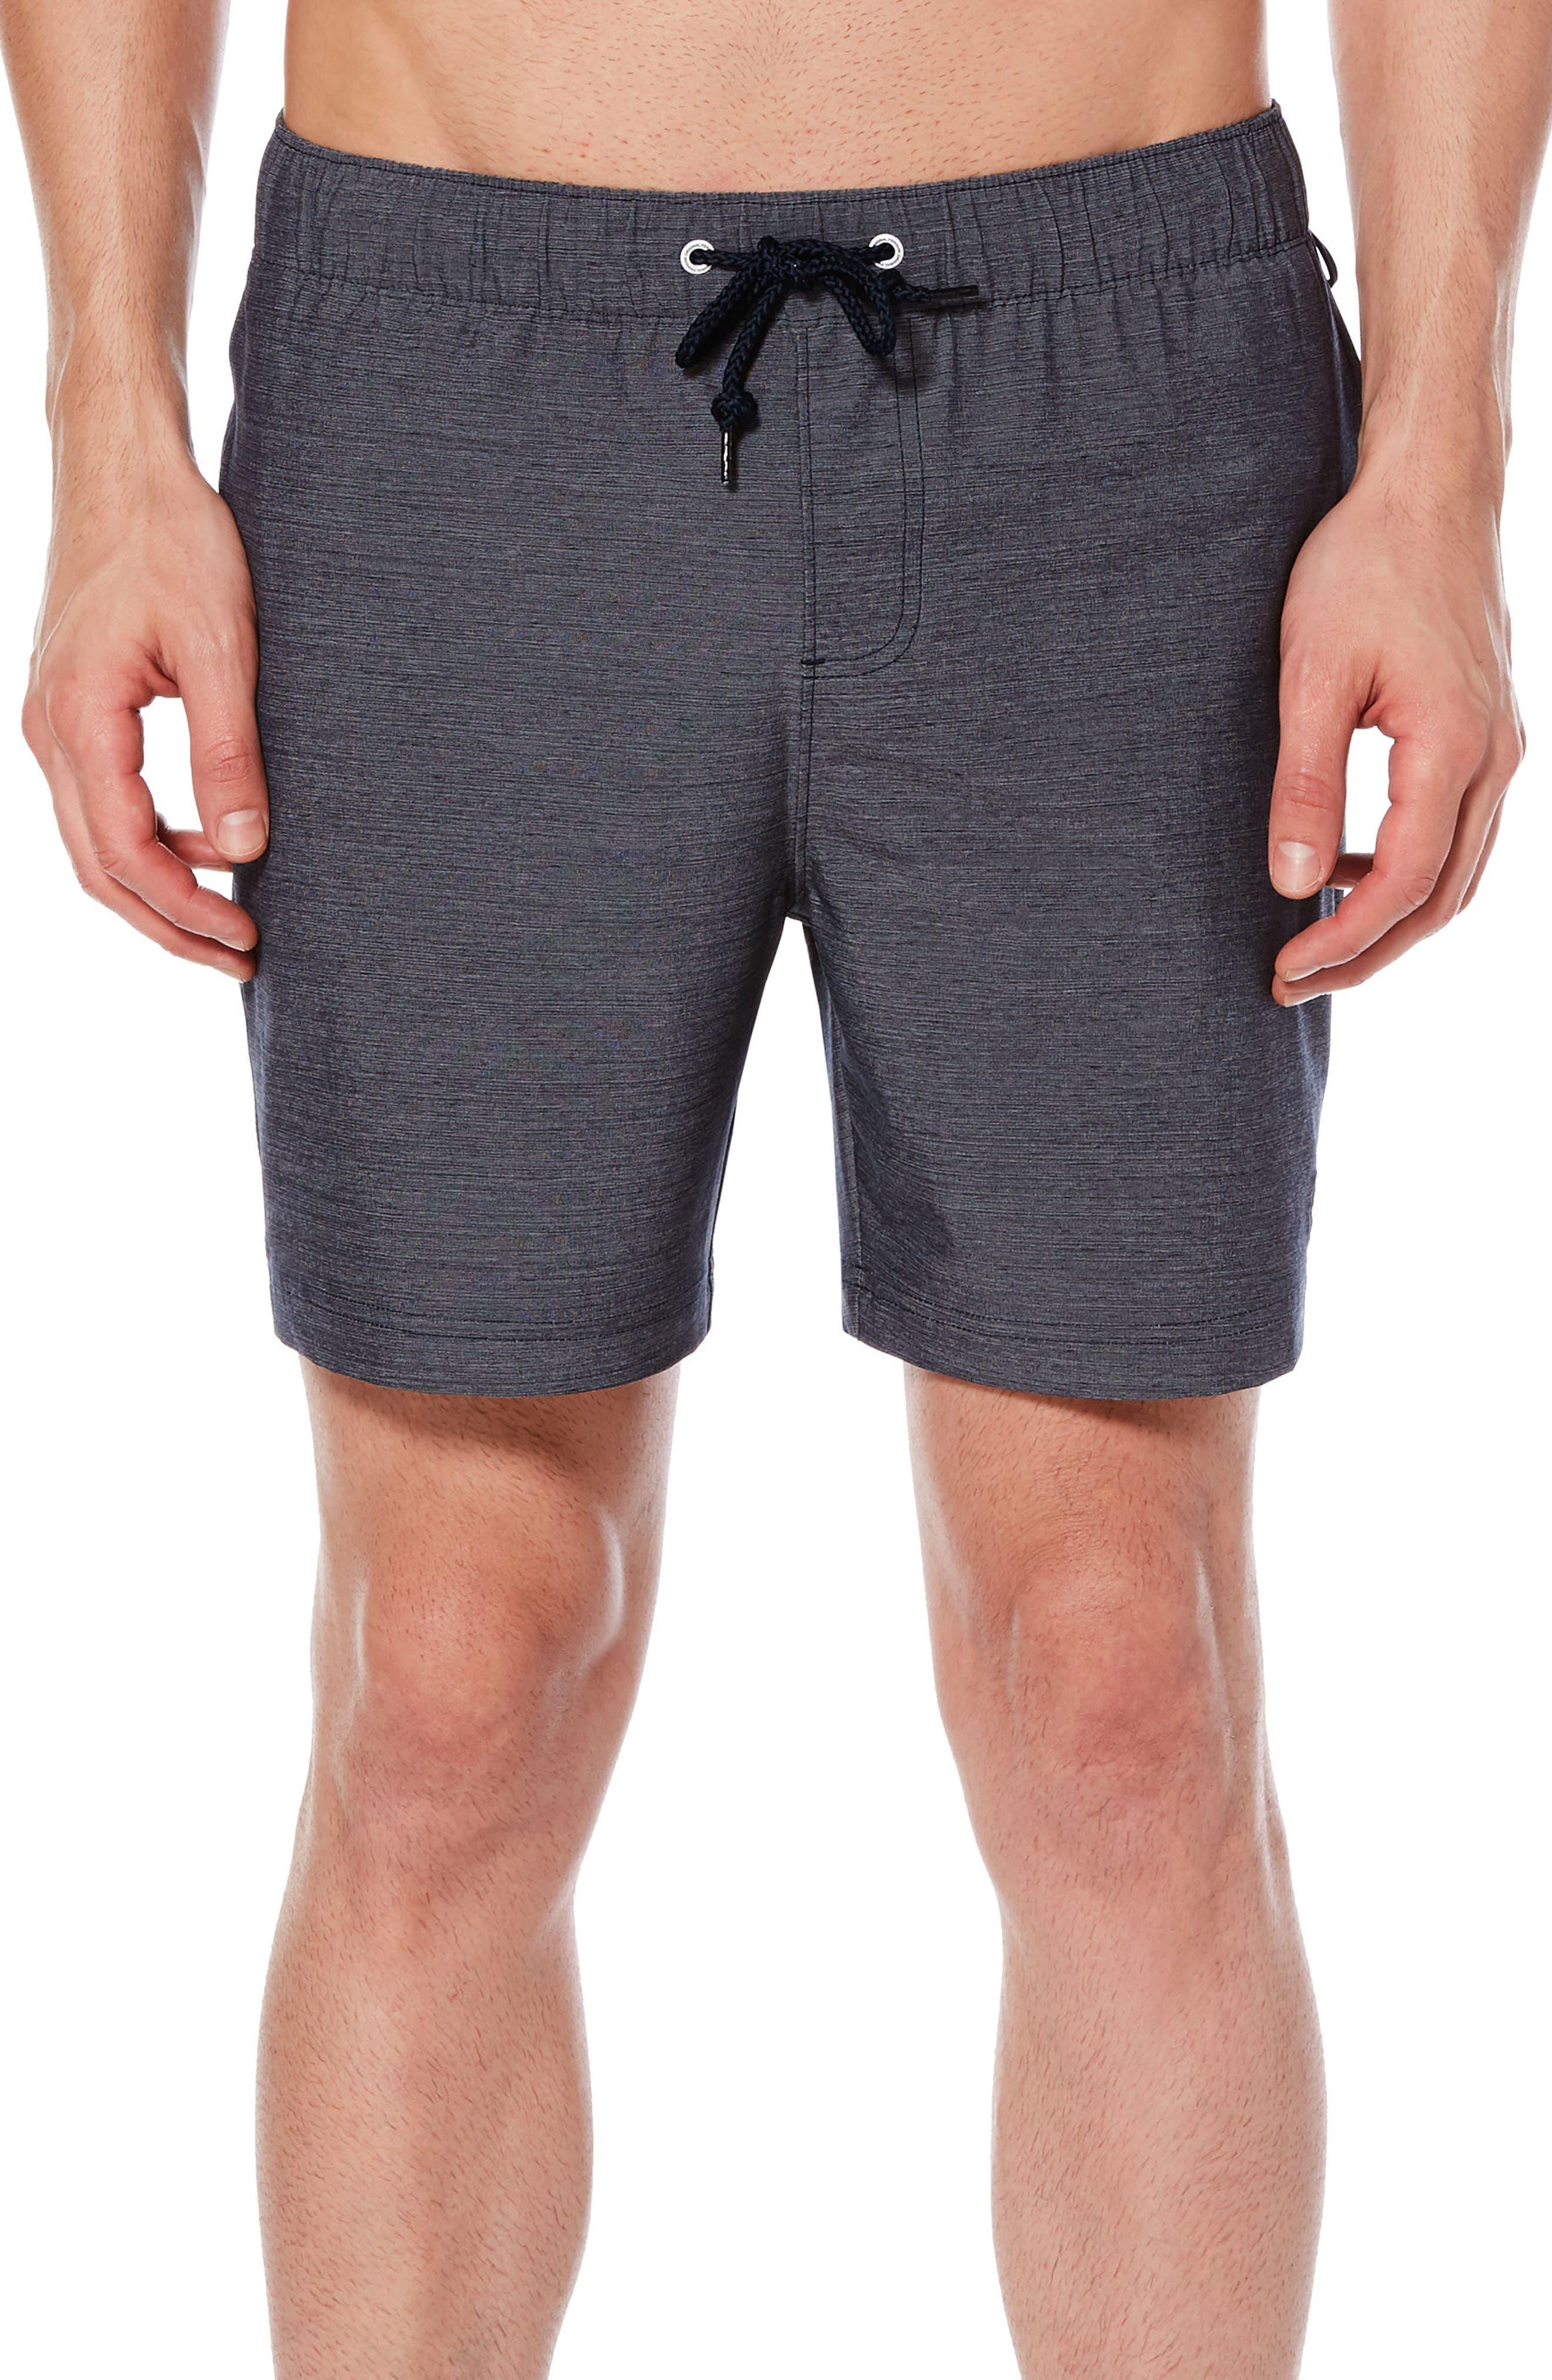 Heathered Elastic Stretch Board Shorts,                         Main,                         color, Dark Sapphire